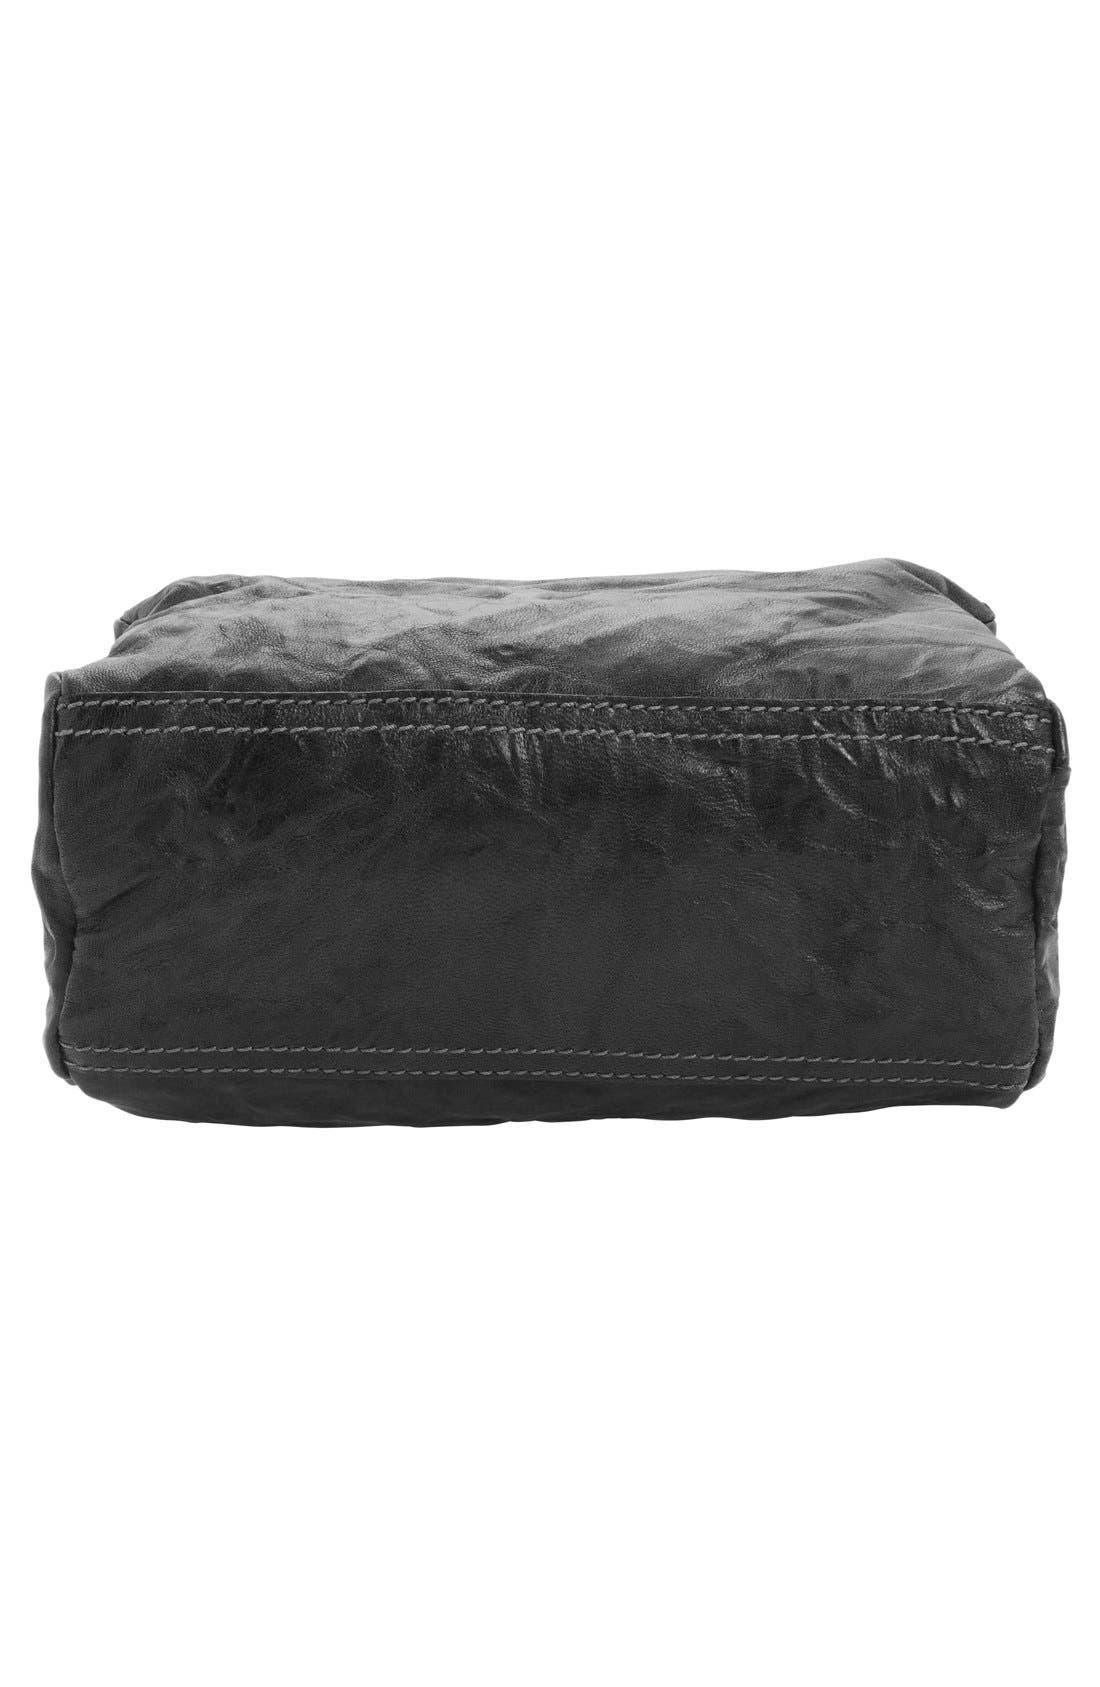 'Mini Pepe Pandora' Leather Shoulder Bag,                             Alternate thumbnail 5, color,                             BLACK